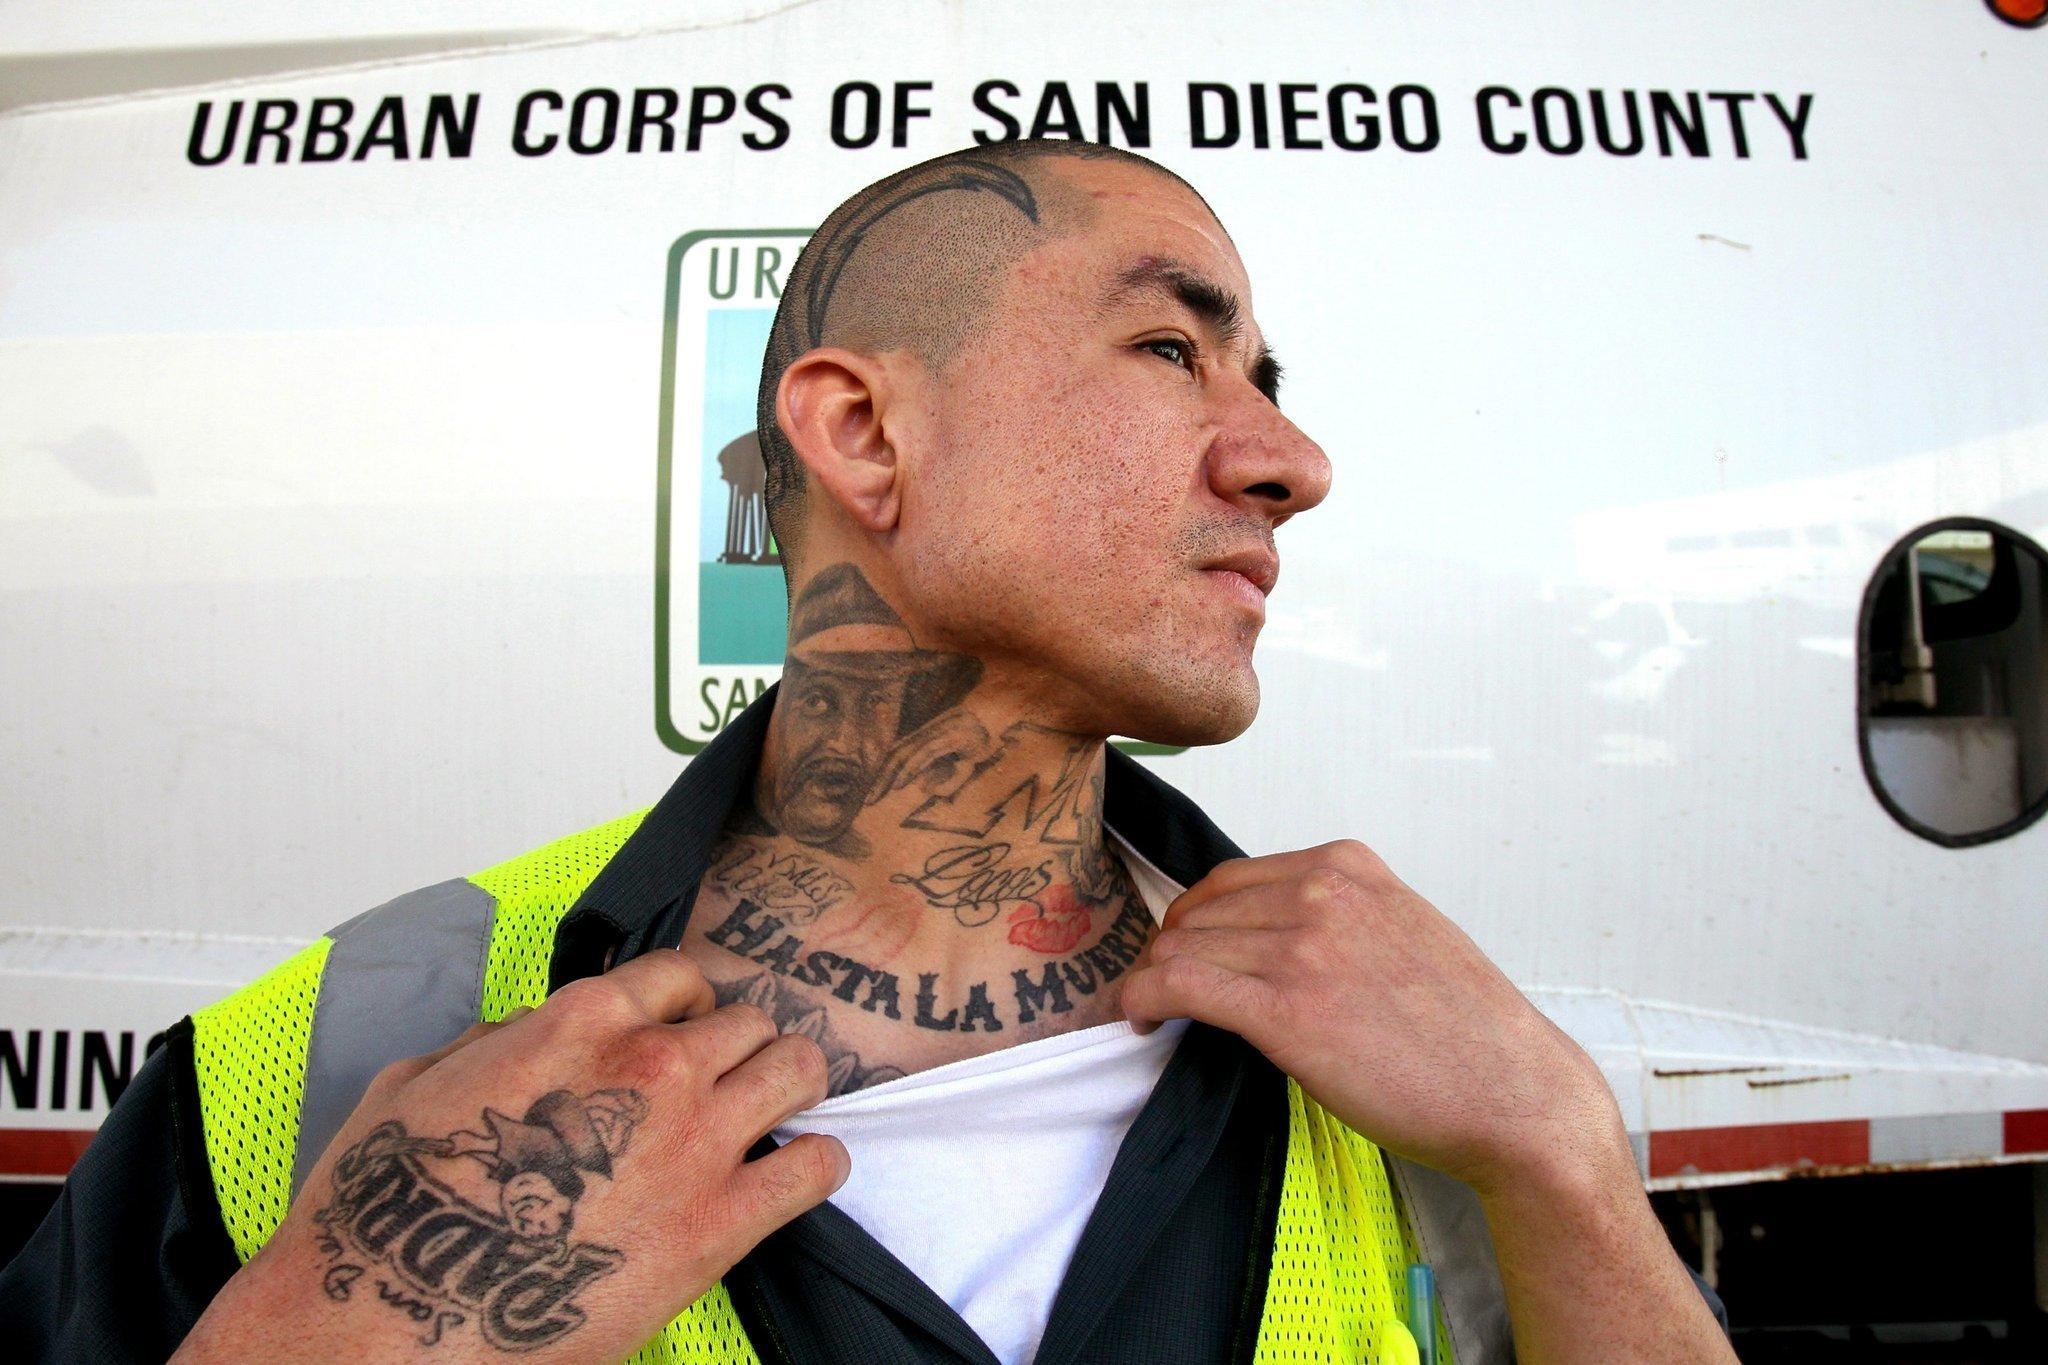 Exgang member earns national honor  The San Diego Union